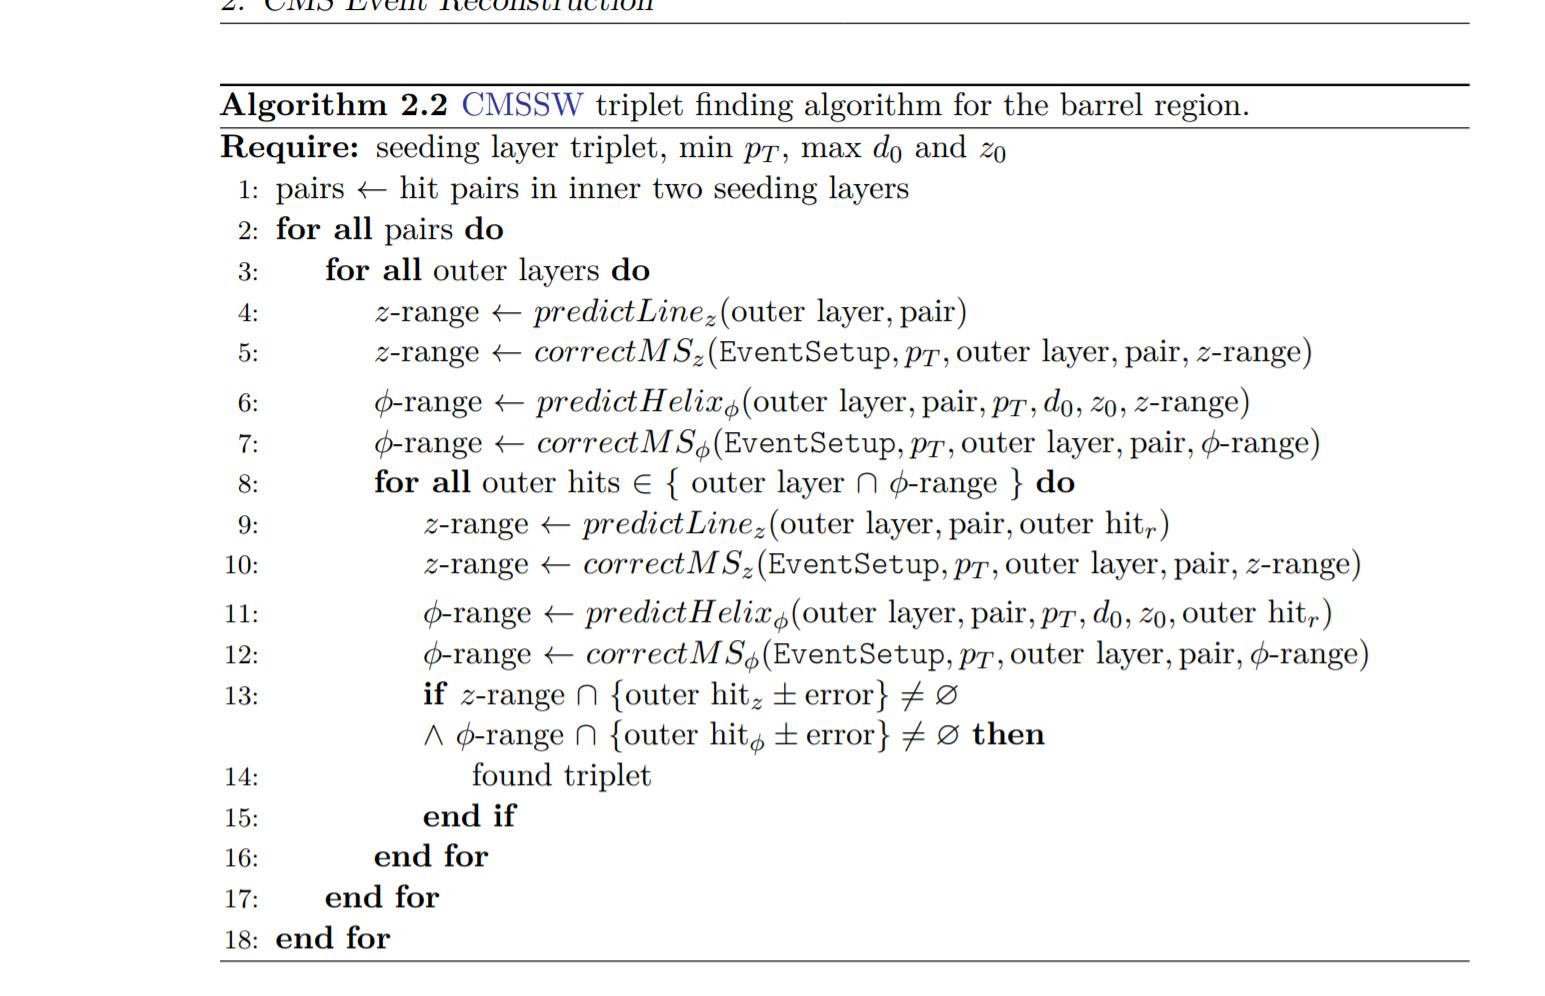 Useful background information | Kaggle